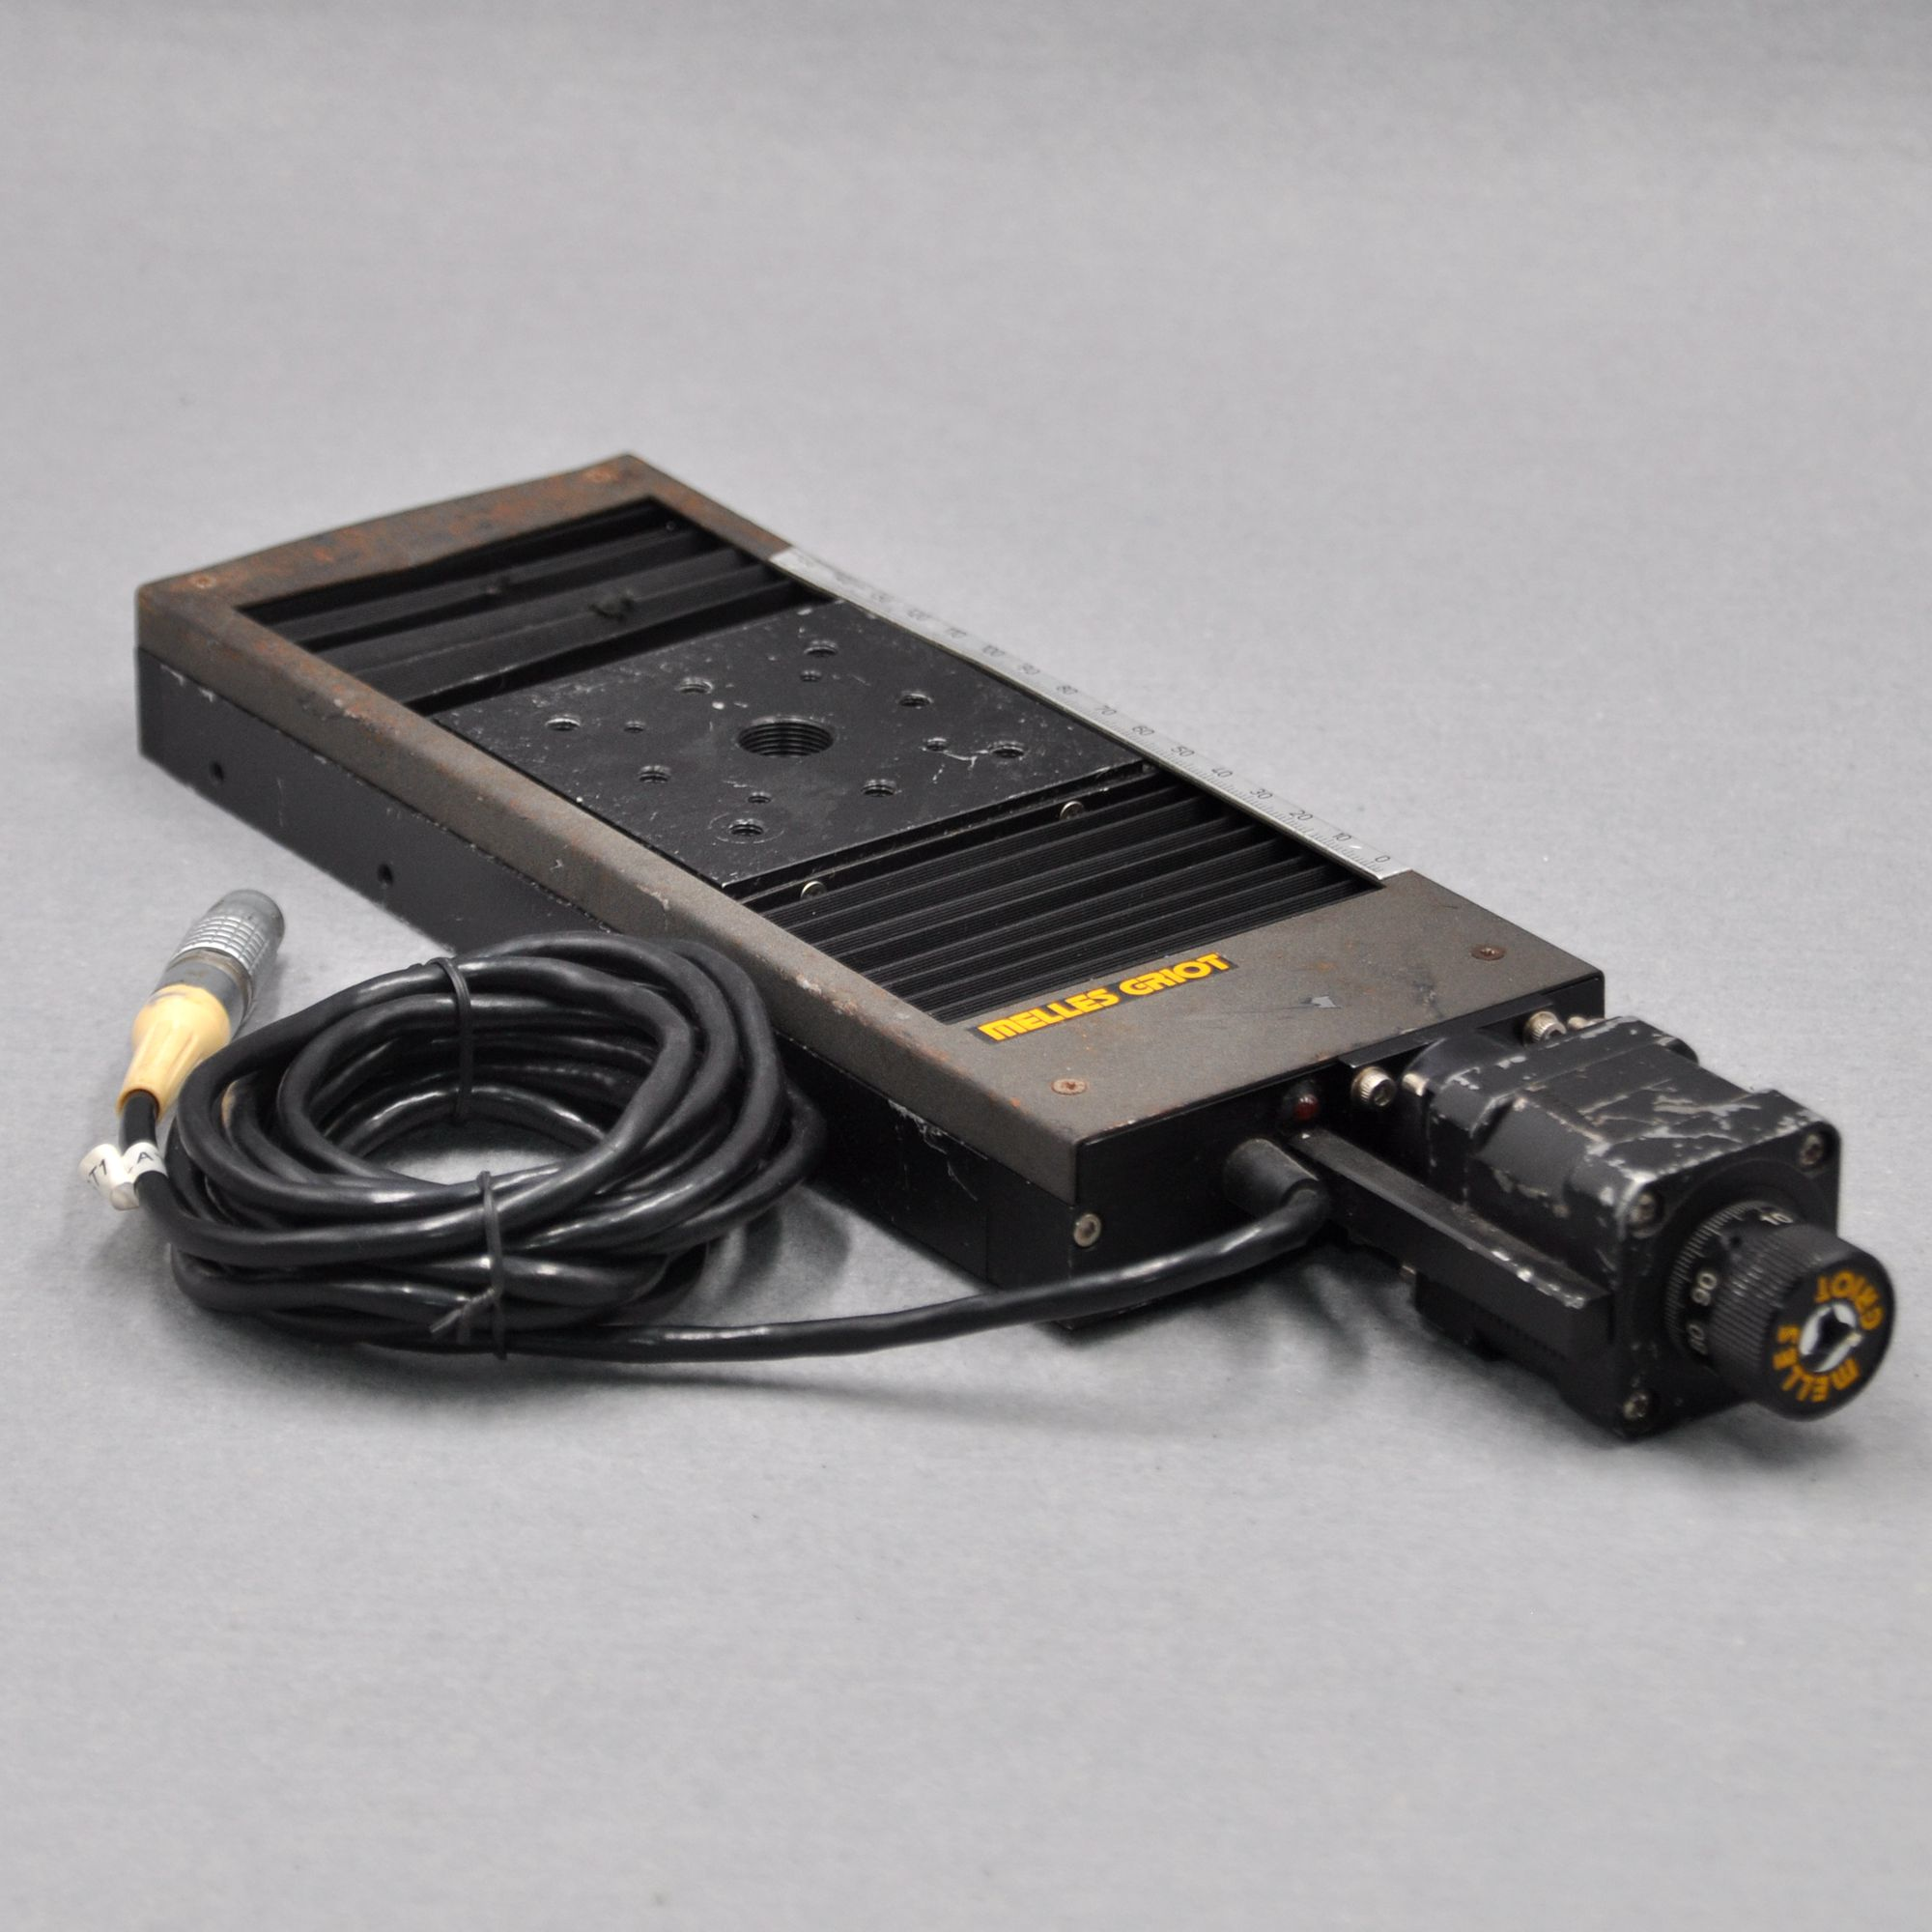 MELLES GRIOT Optical Precision Fine-tuning Horizontal Displacement Slide 80 * 80mm Stroke Plus Or Minus 105mm